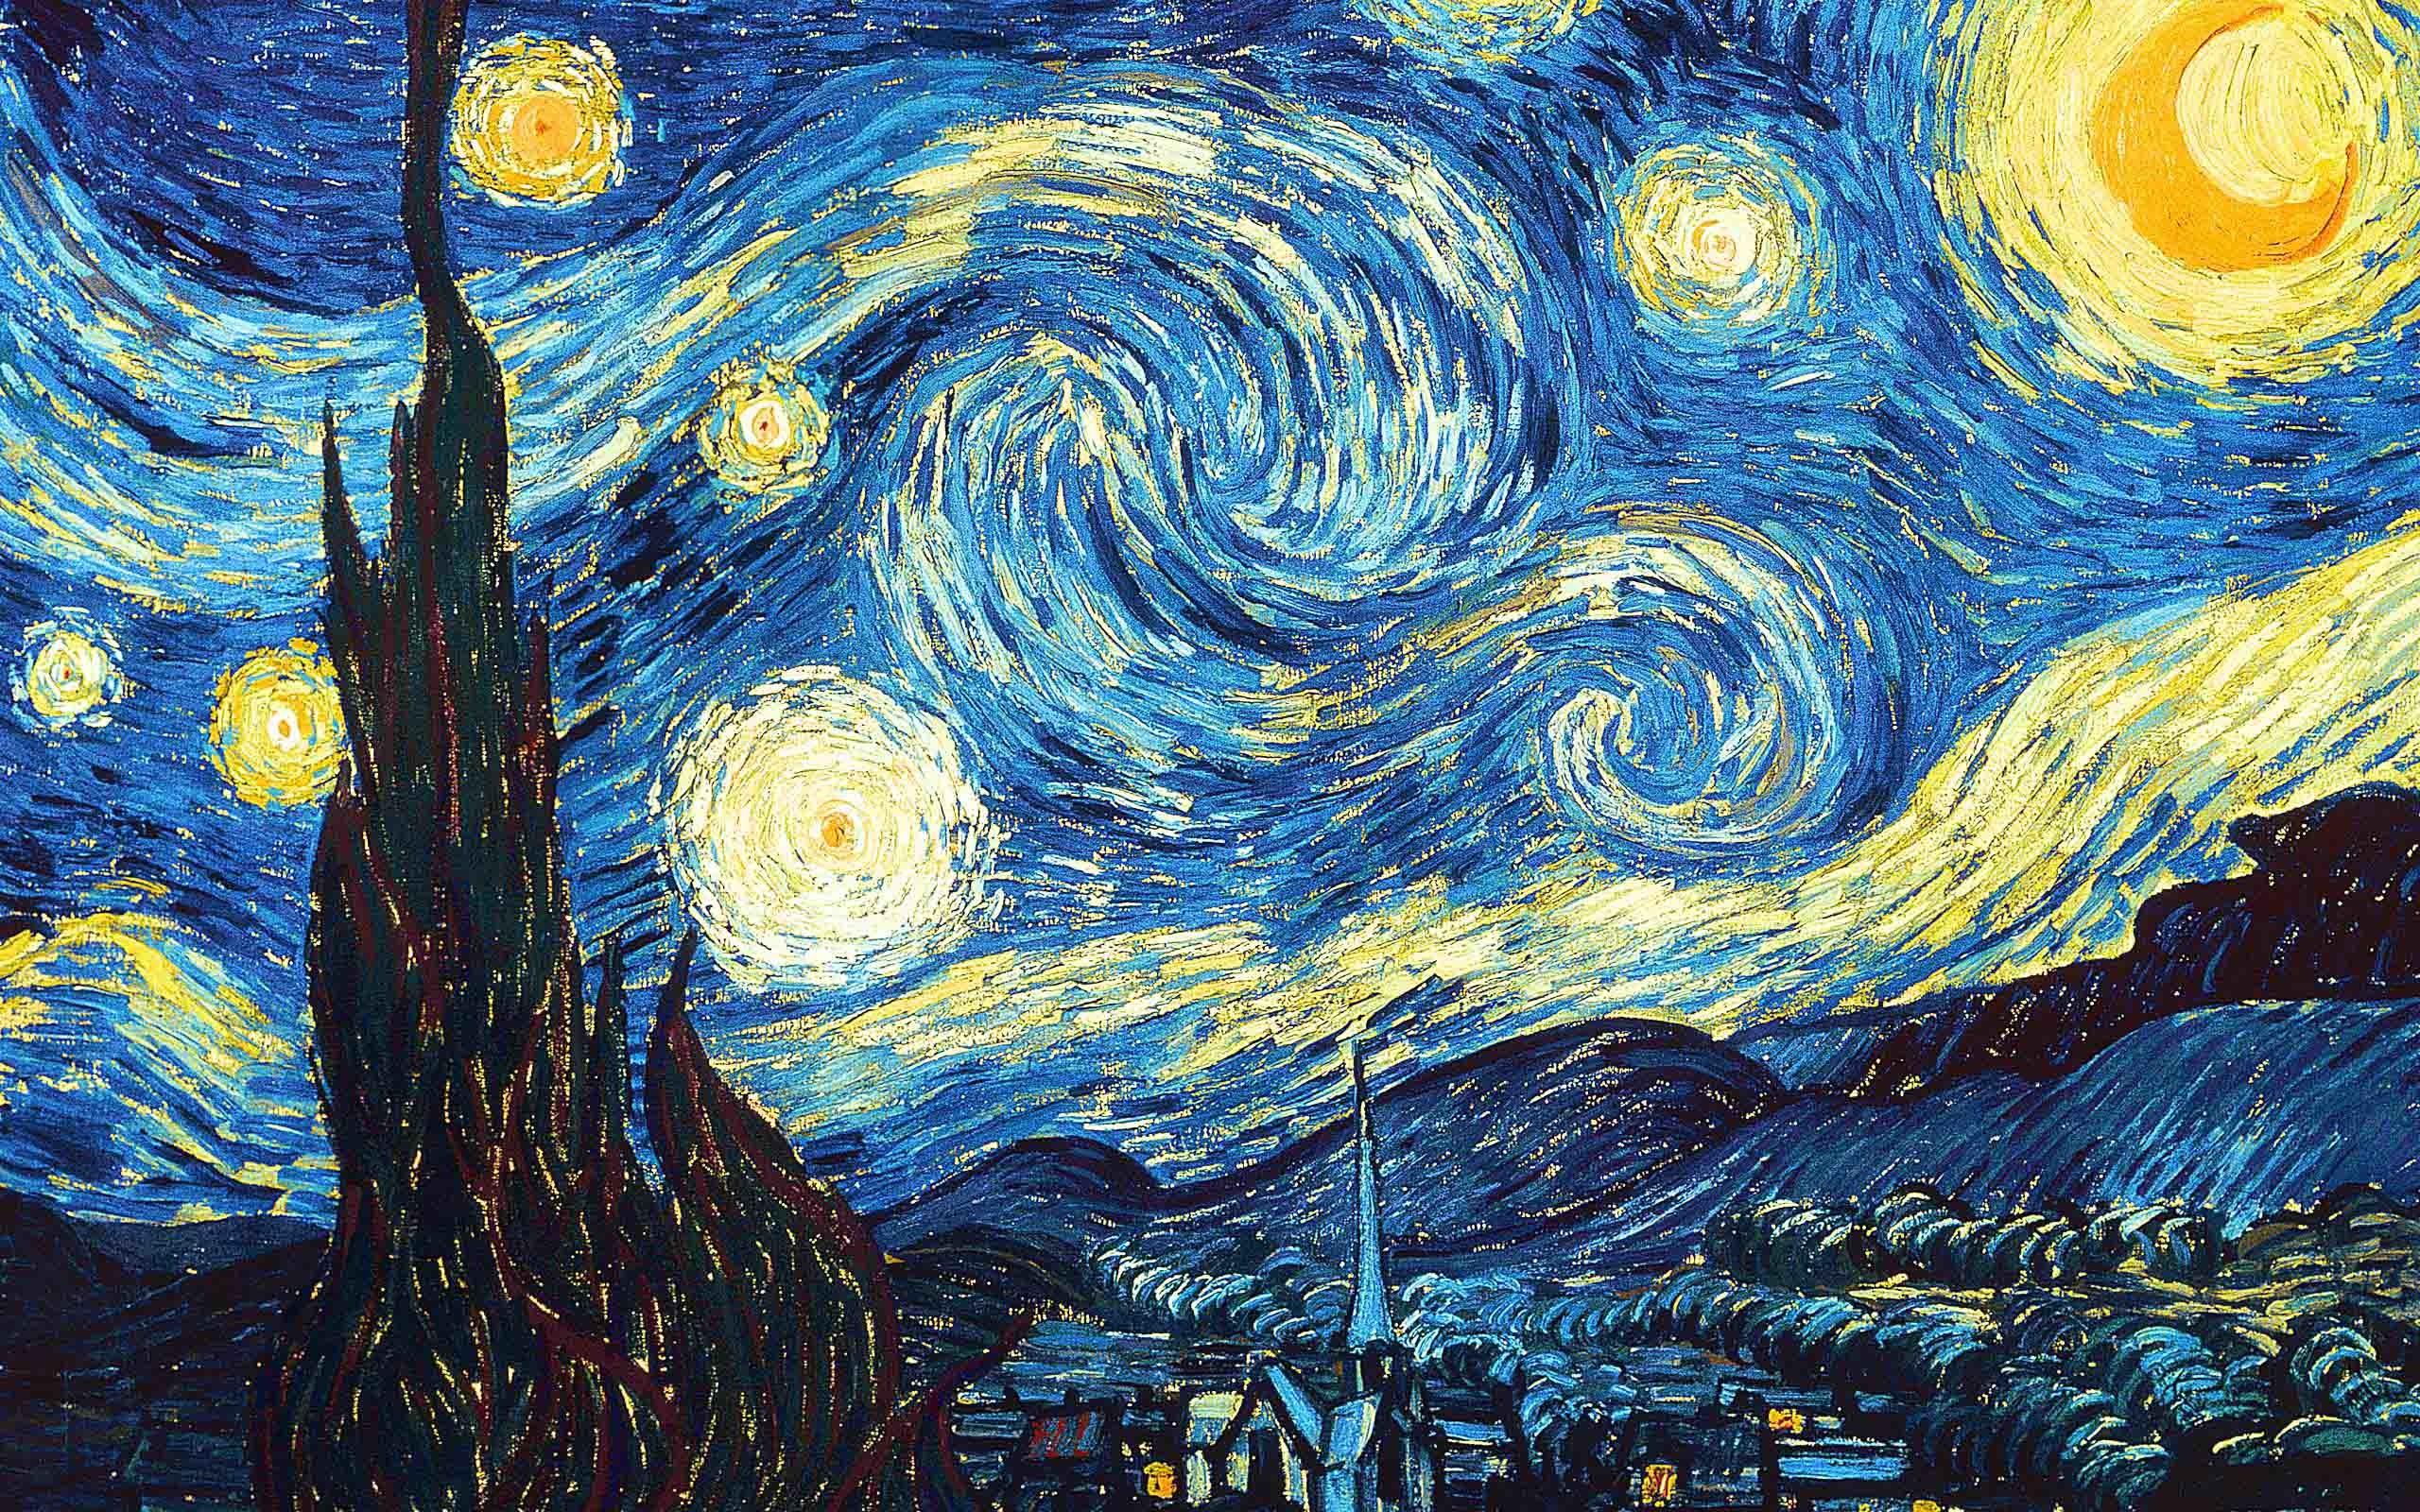 Great Wallpaper Home Screen Artsy - 609020-full-size-artsy-desktop-backgrounds-2560x1600-phone  Gallery_58212.jpg